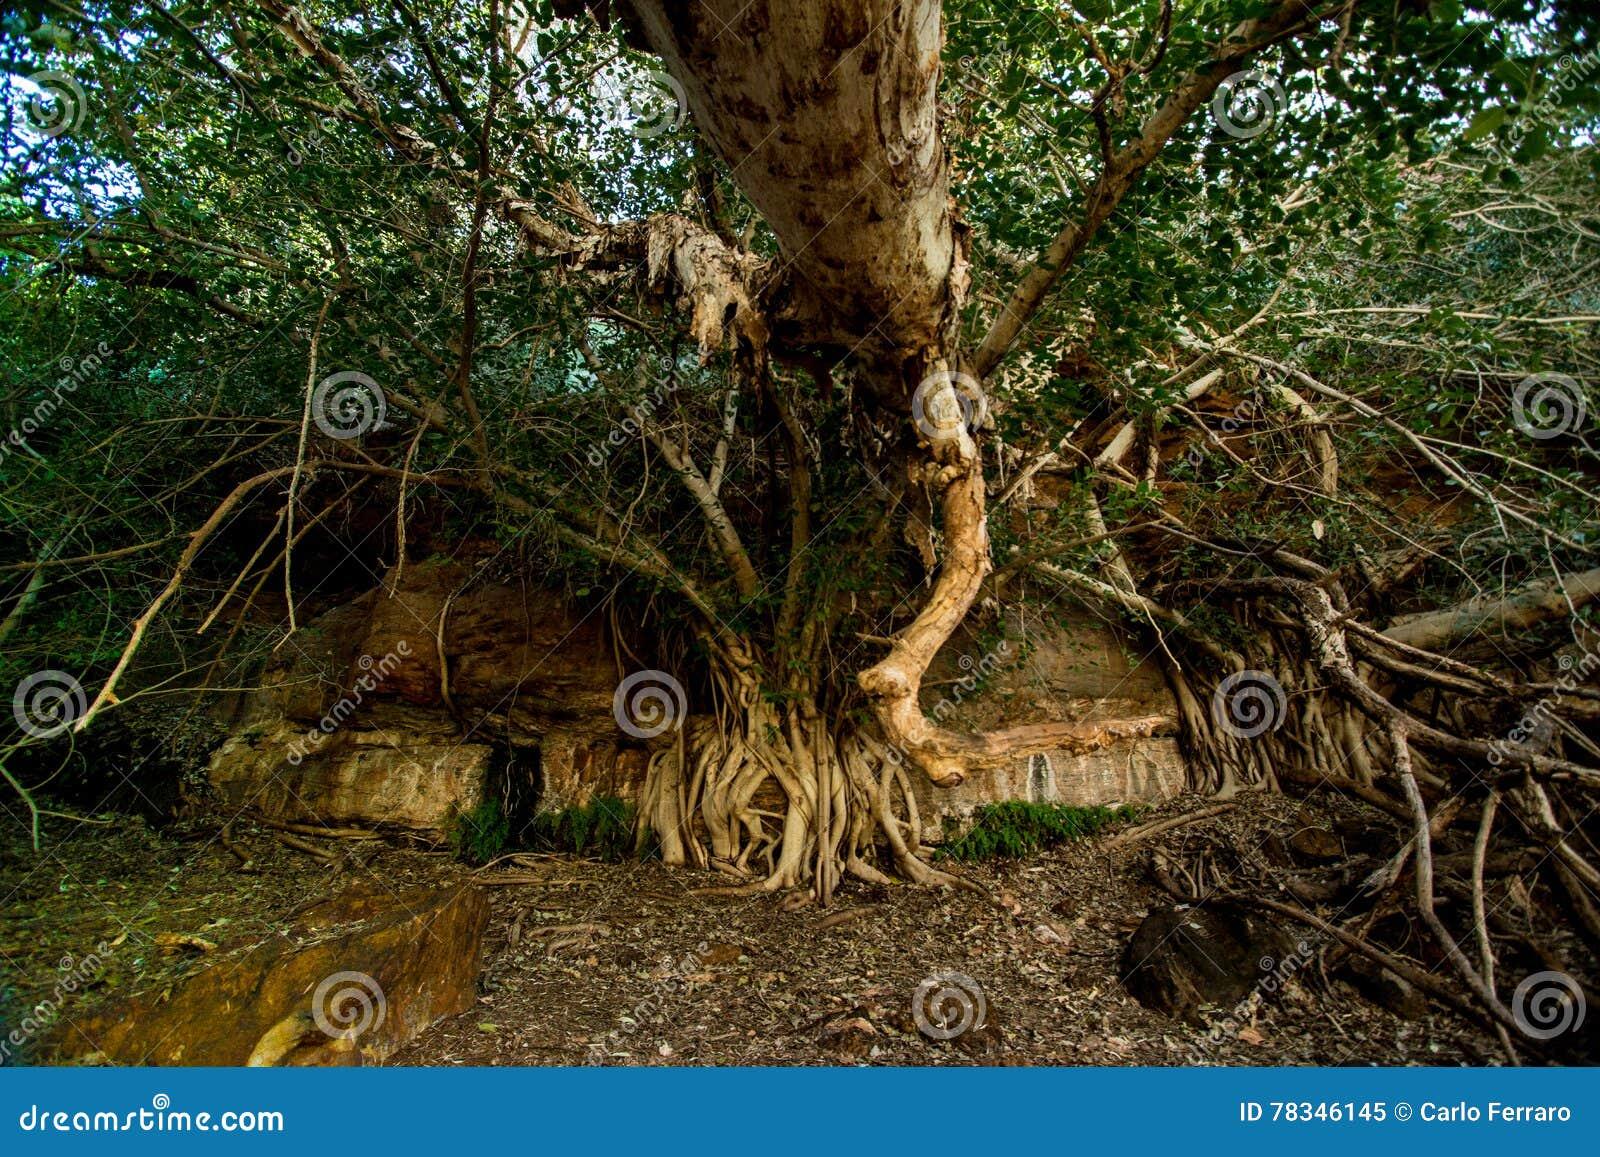 Dales Gorge tree, Karijini National Park